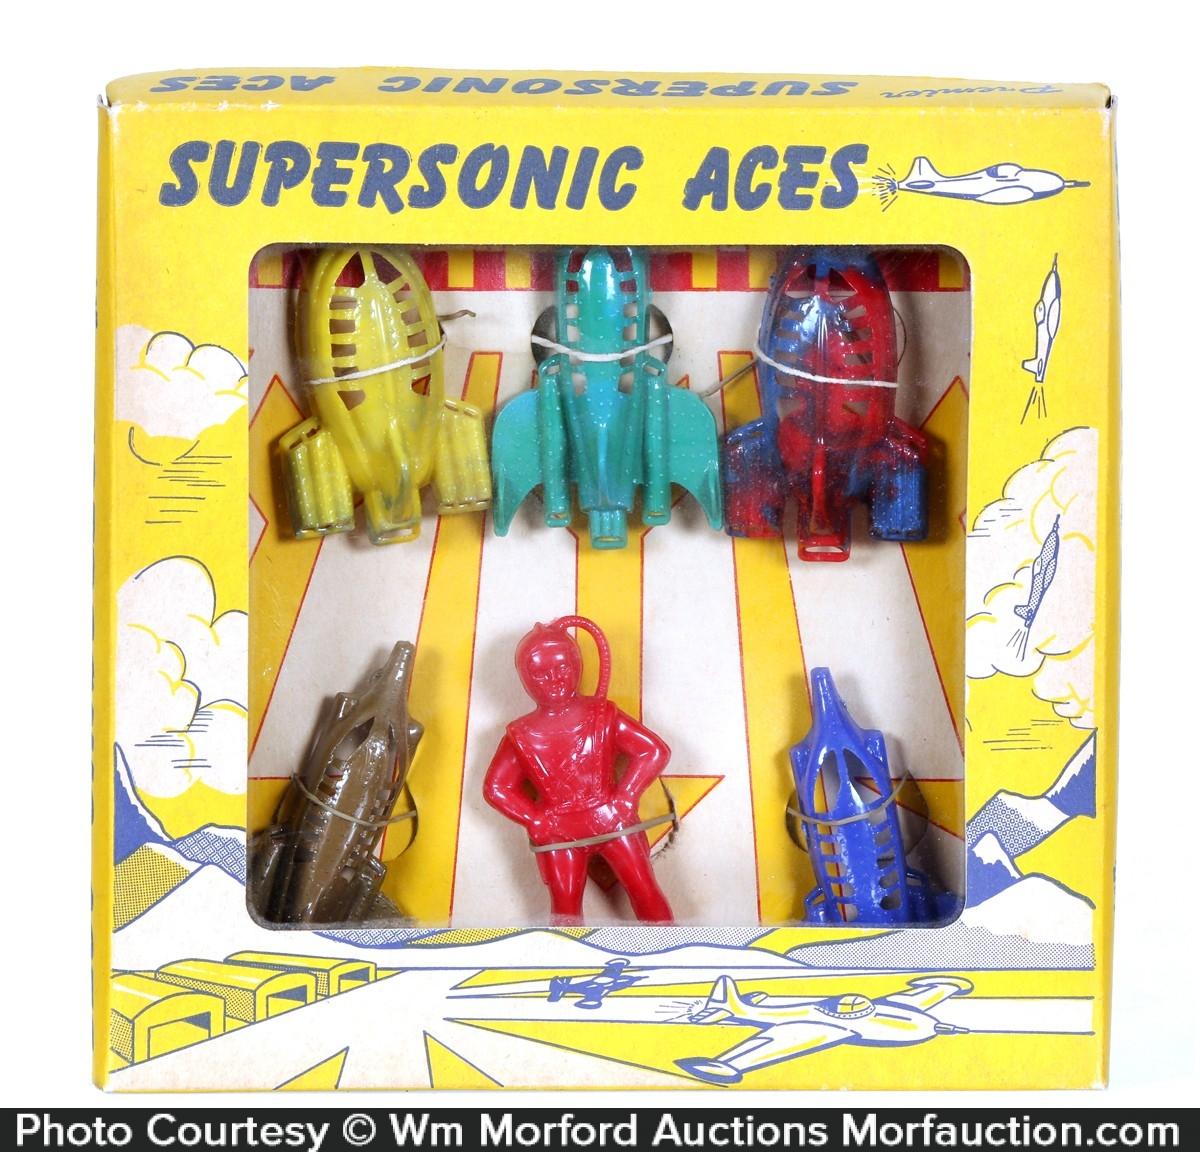 Supersonic Aces Toy Set